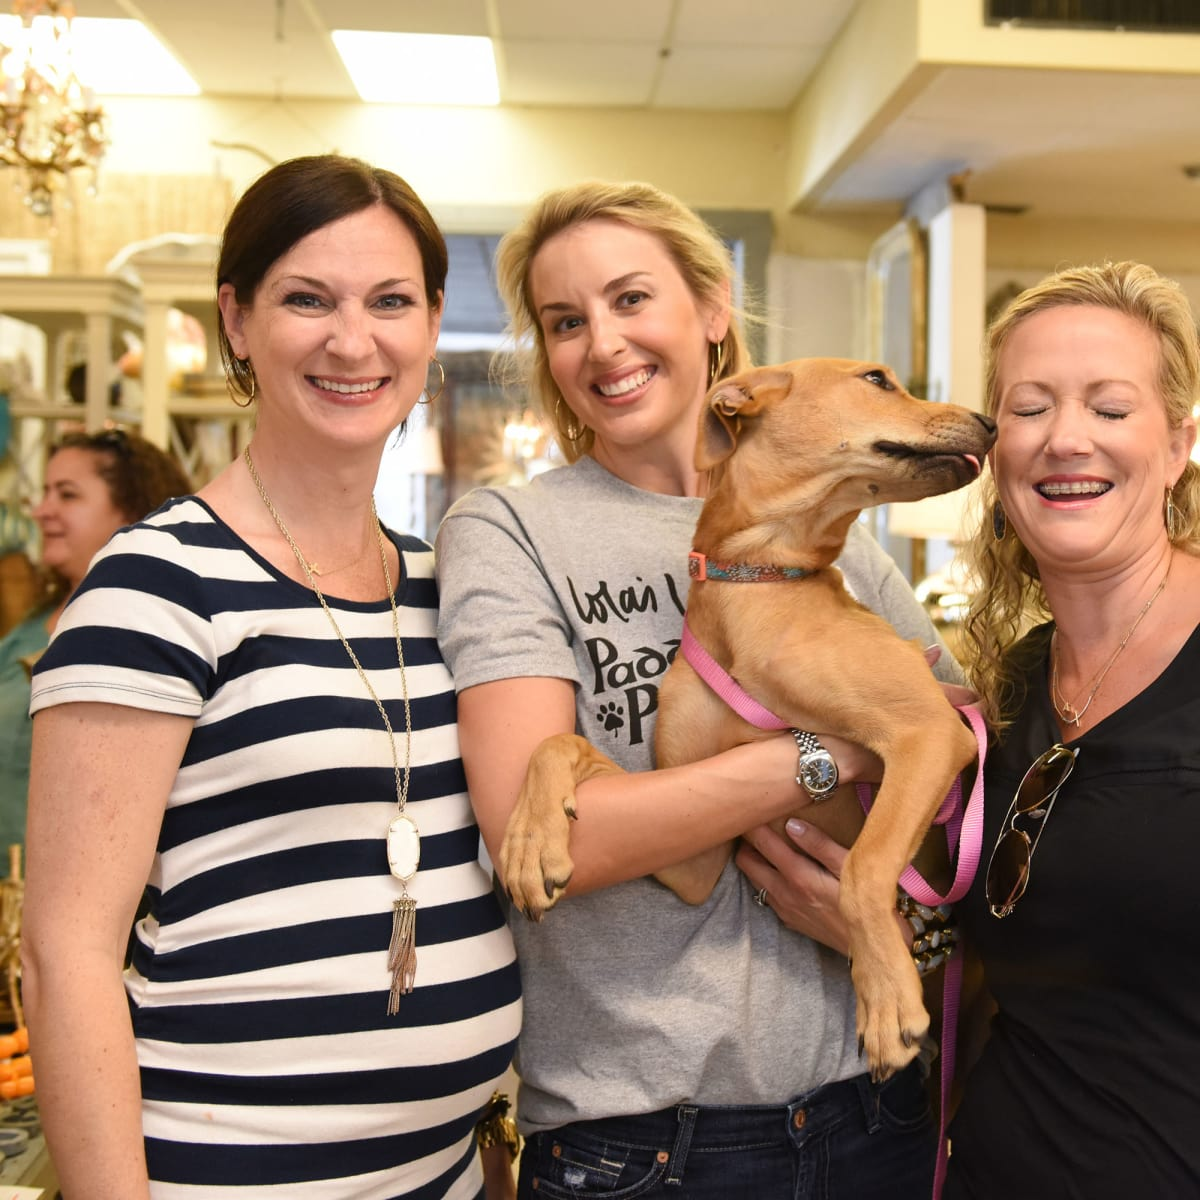 News, Shelby, Barks & Bubbles, Memorial Antiques, July 2015, Rachel Nolan, Jenny Thompson, Courtney Duperie, Sandy